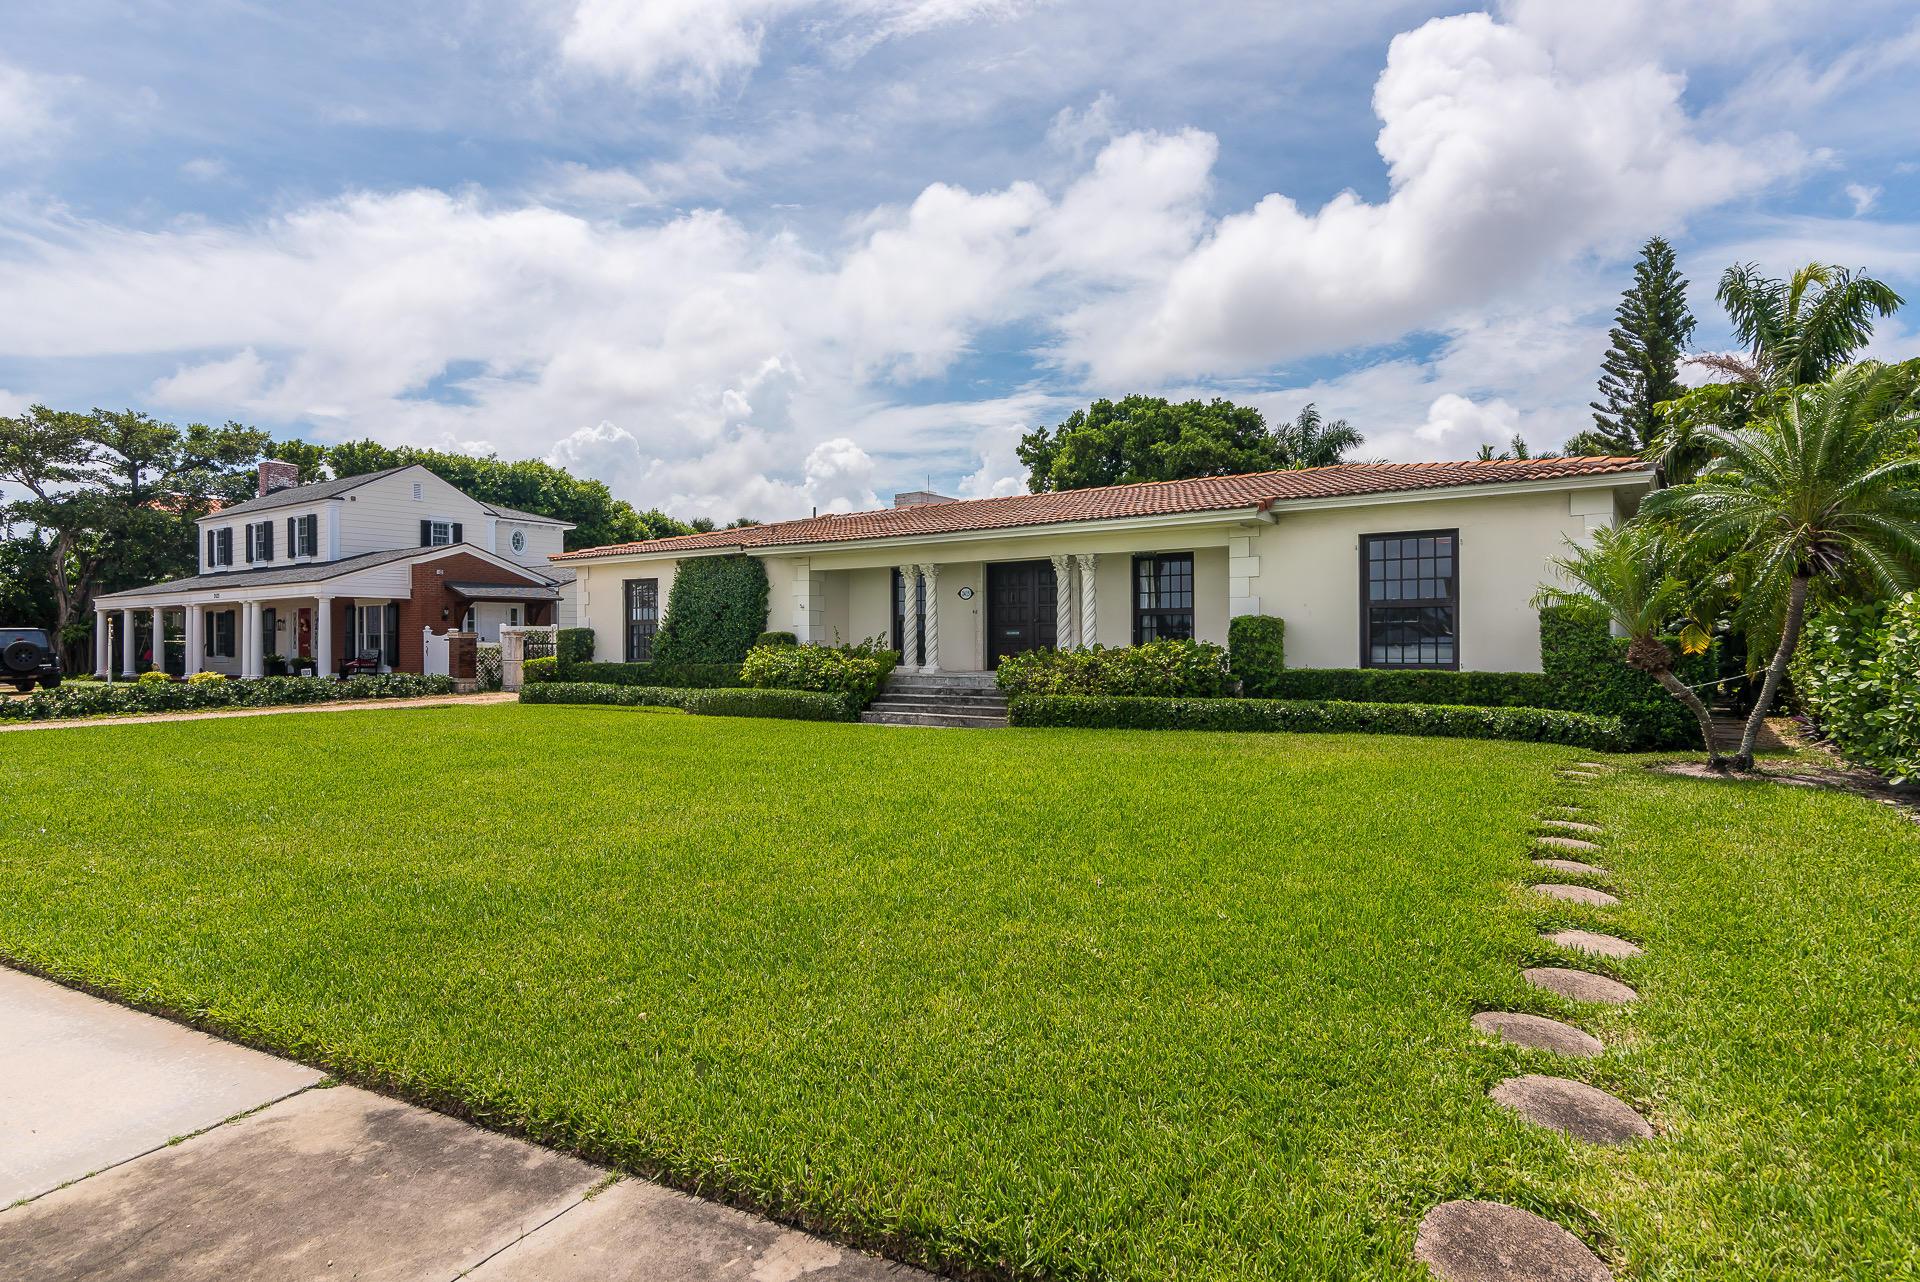 2415 Flagler Drive, West Palm Beach, Florida 33401, 3 Bedrooms Bedrooms, ,3 BathroomsBathrooms,Single Family,For Sale,Flagler,RX-10507222